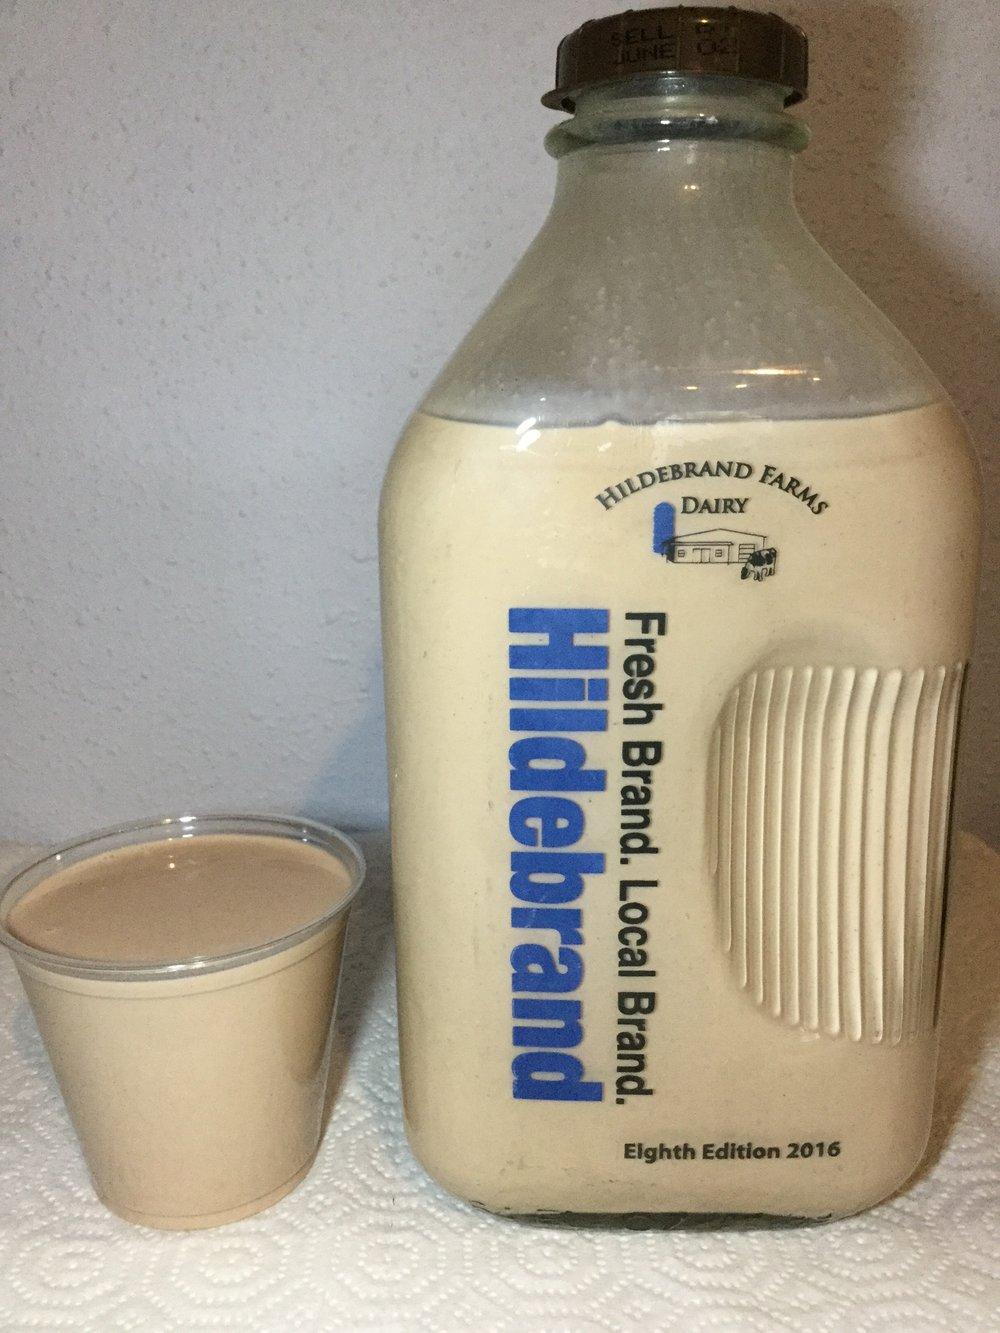 Hildebrand Farms Dairy Chocolate Milk Cup